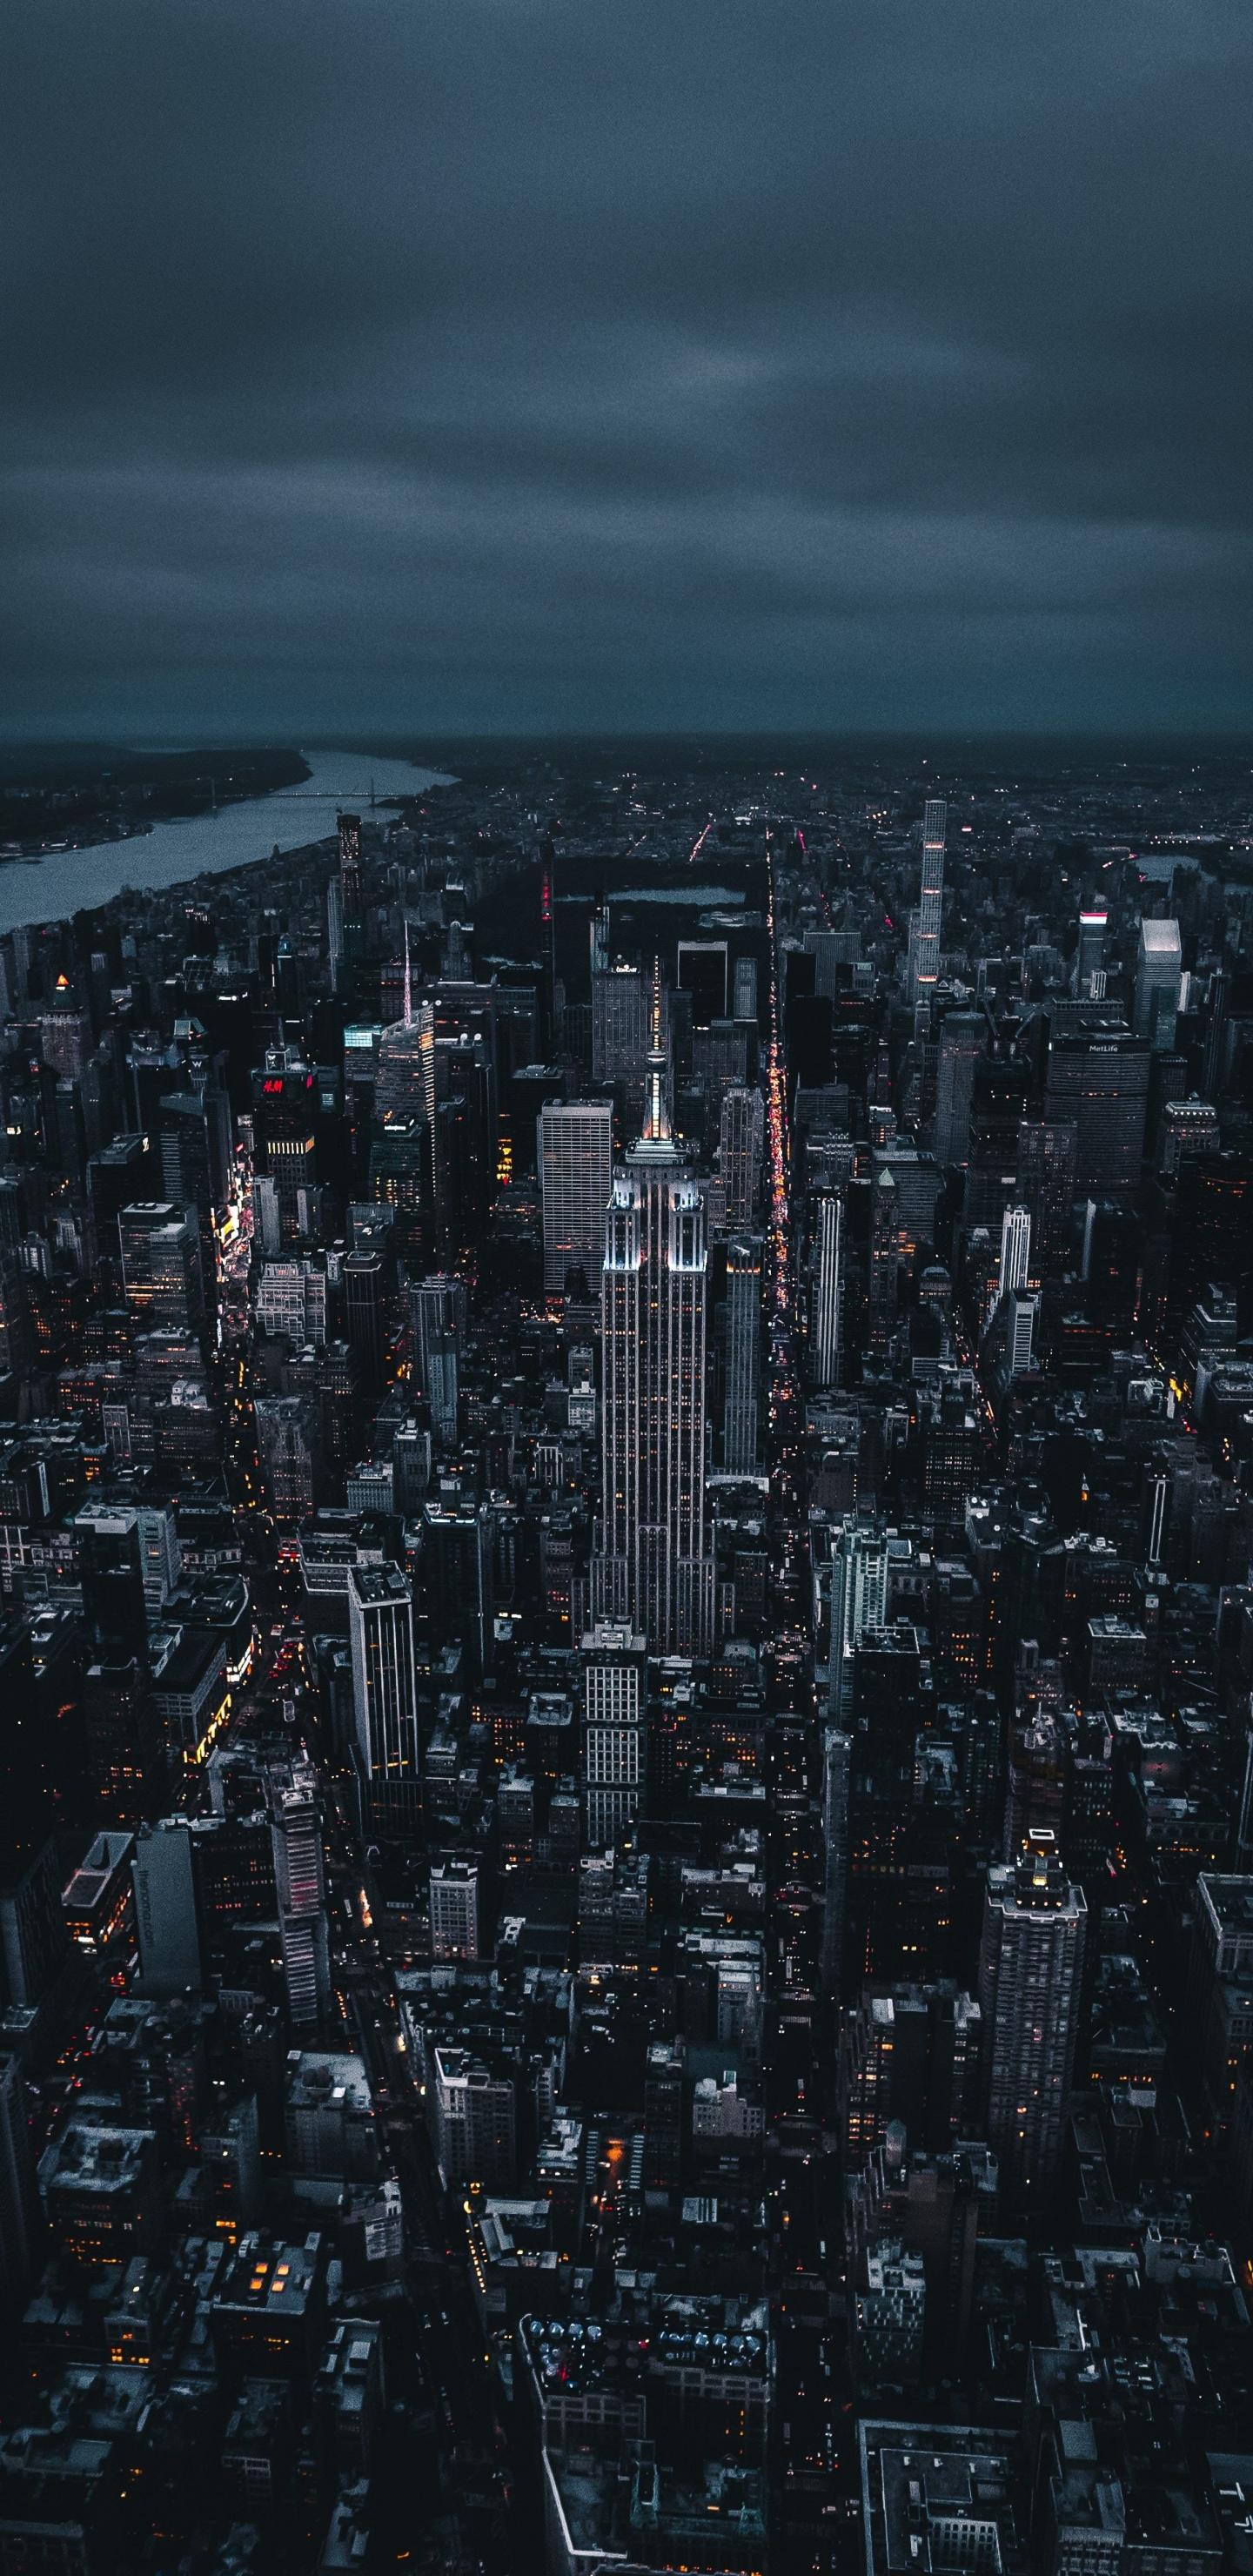 Download 1440x2960 Wallpaper New York Dark Night City Aerial View Samsung Galaxy S8 Samsung Galaxy S8 Plus 1440x2960 Hd Image Background 16532